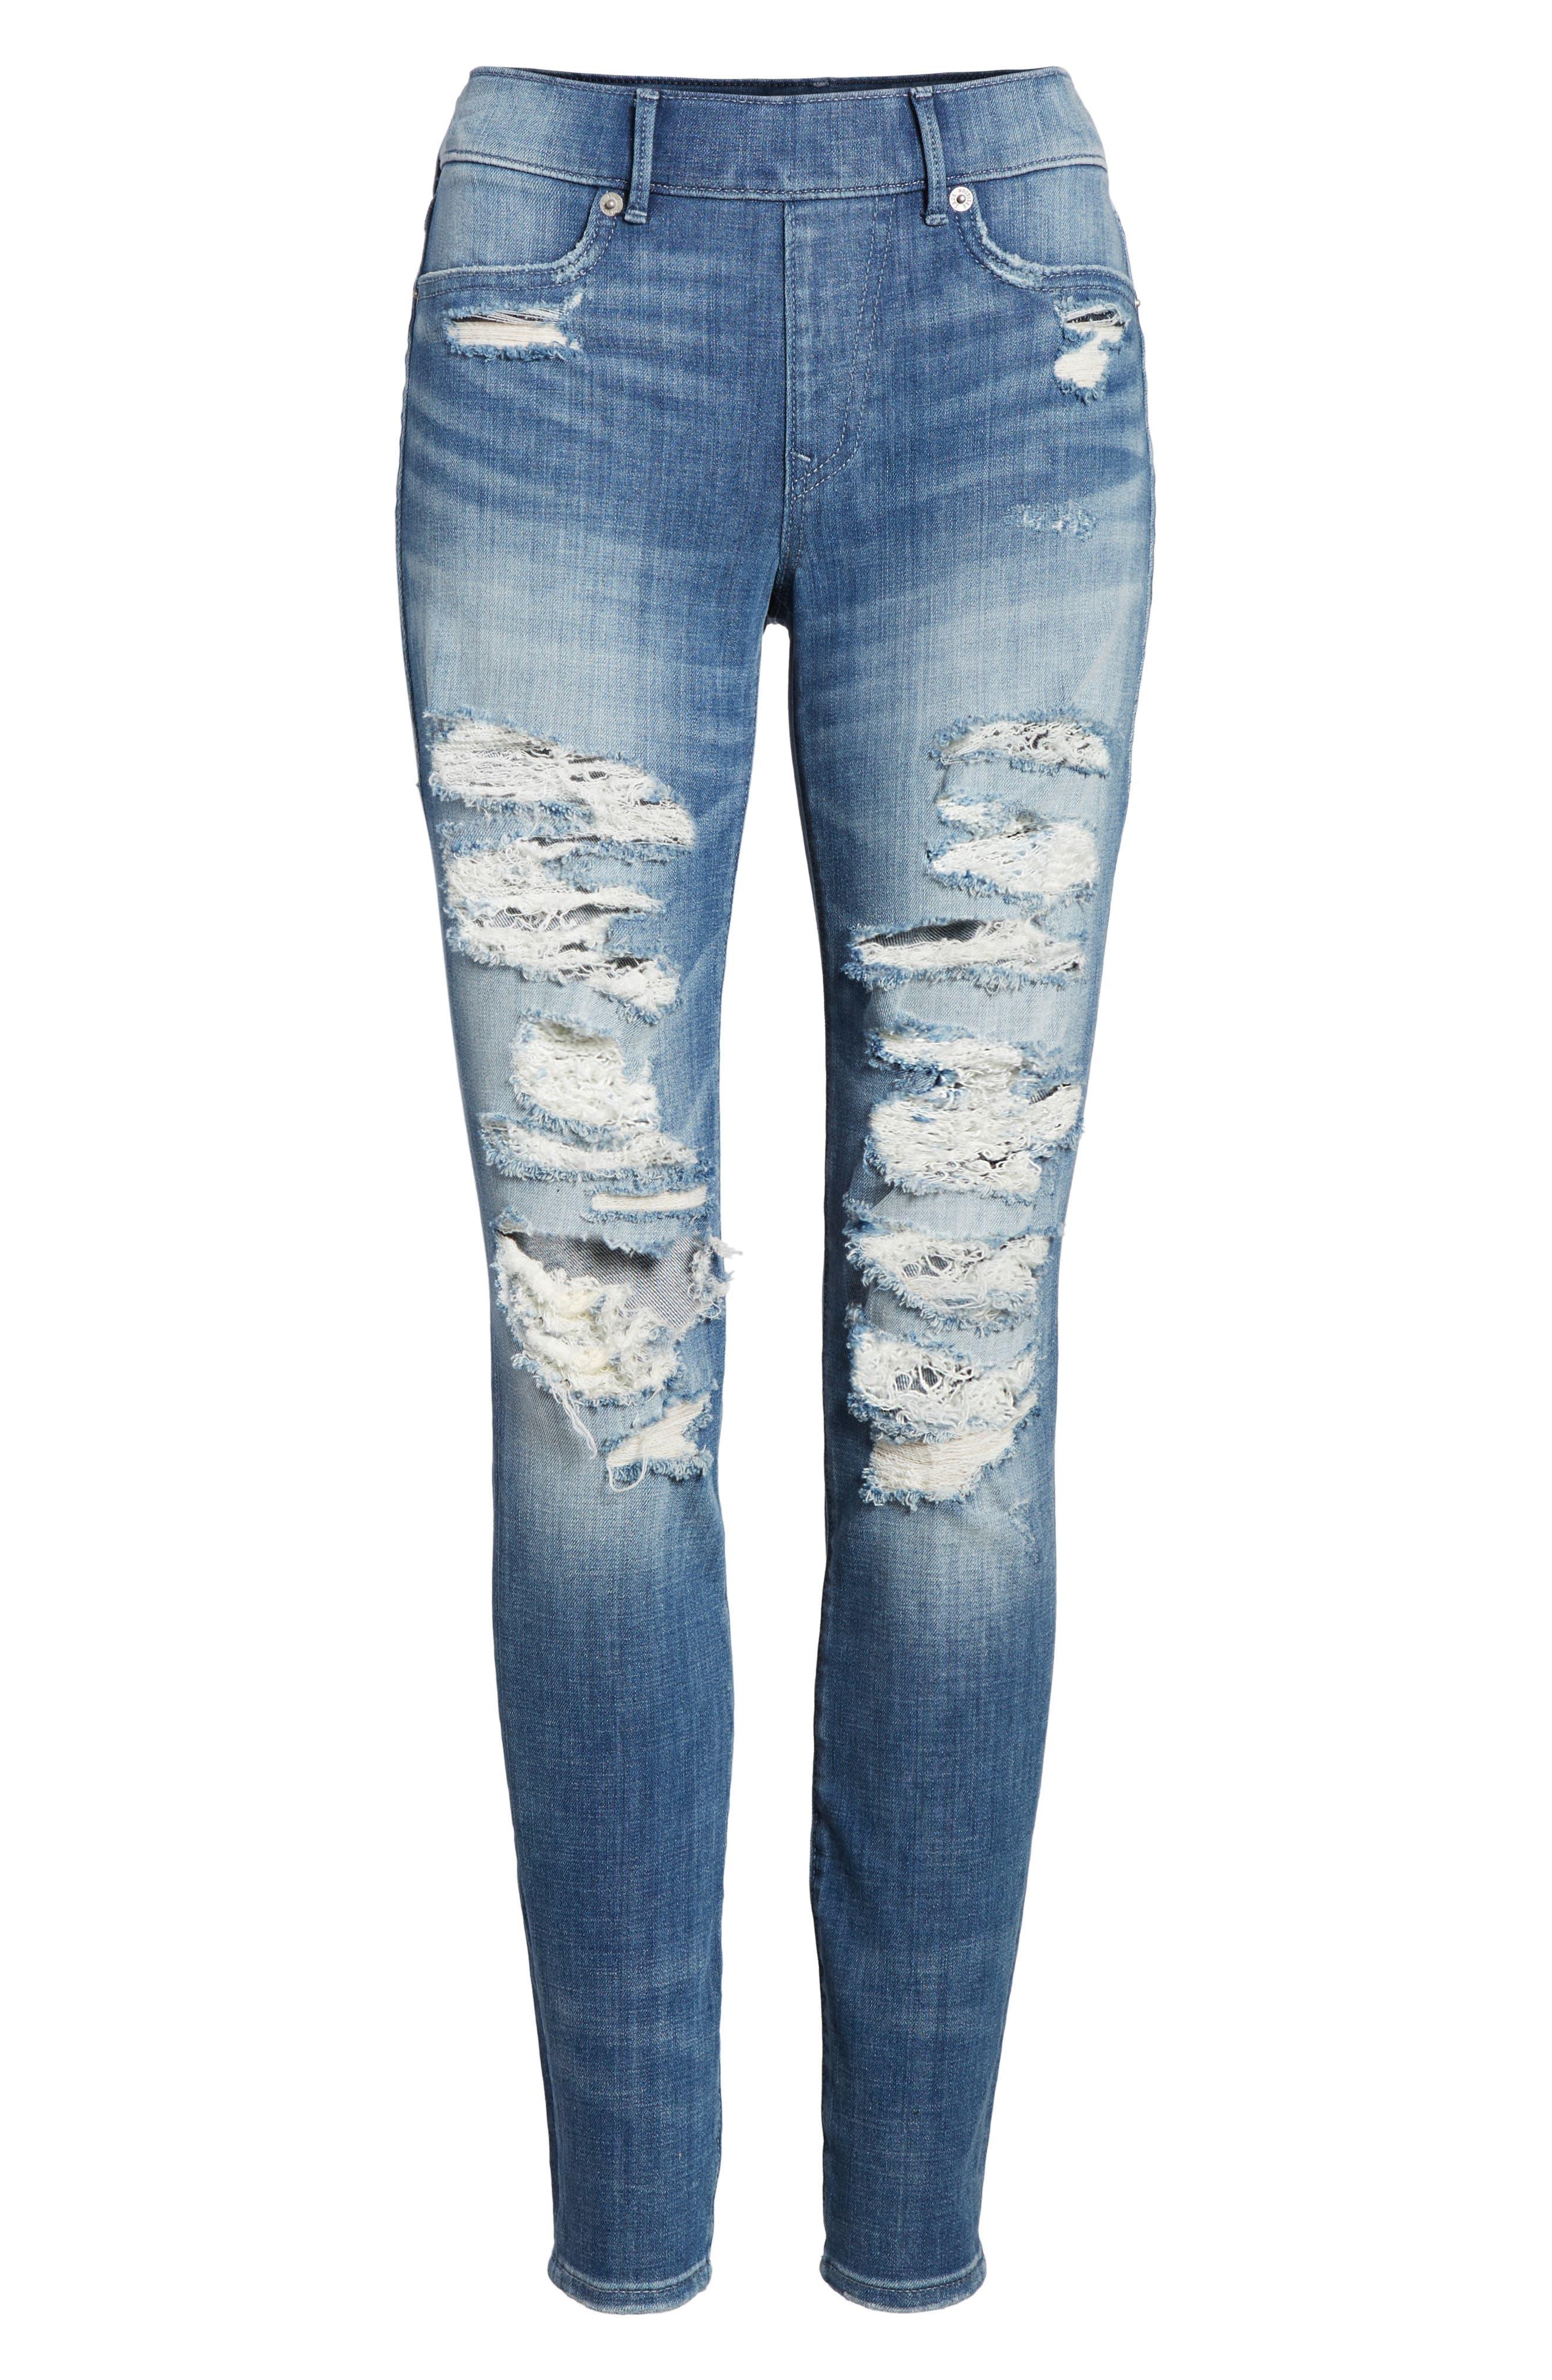 Jennie Runaway Legging Jeans,                             Alternate thumbnail 7, color,                             401